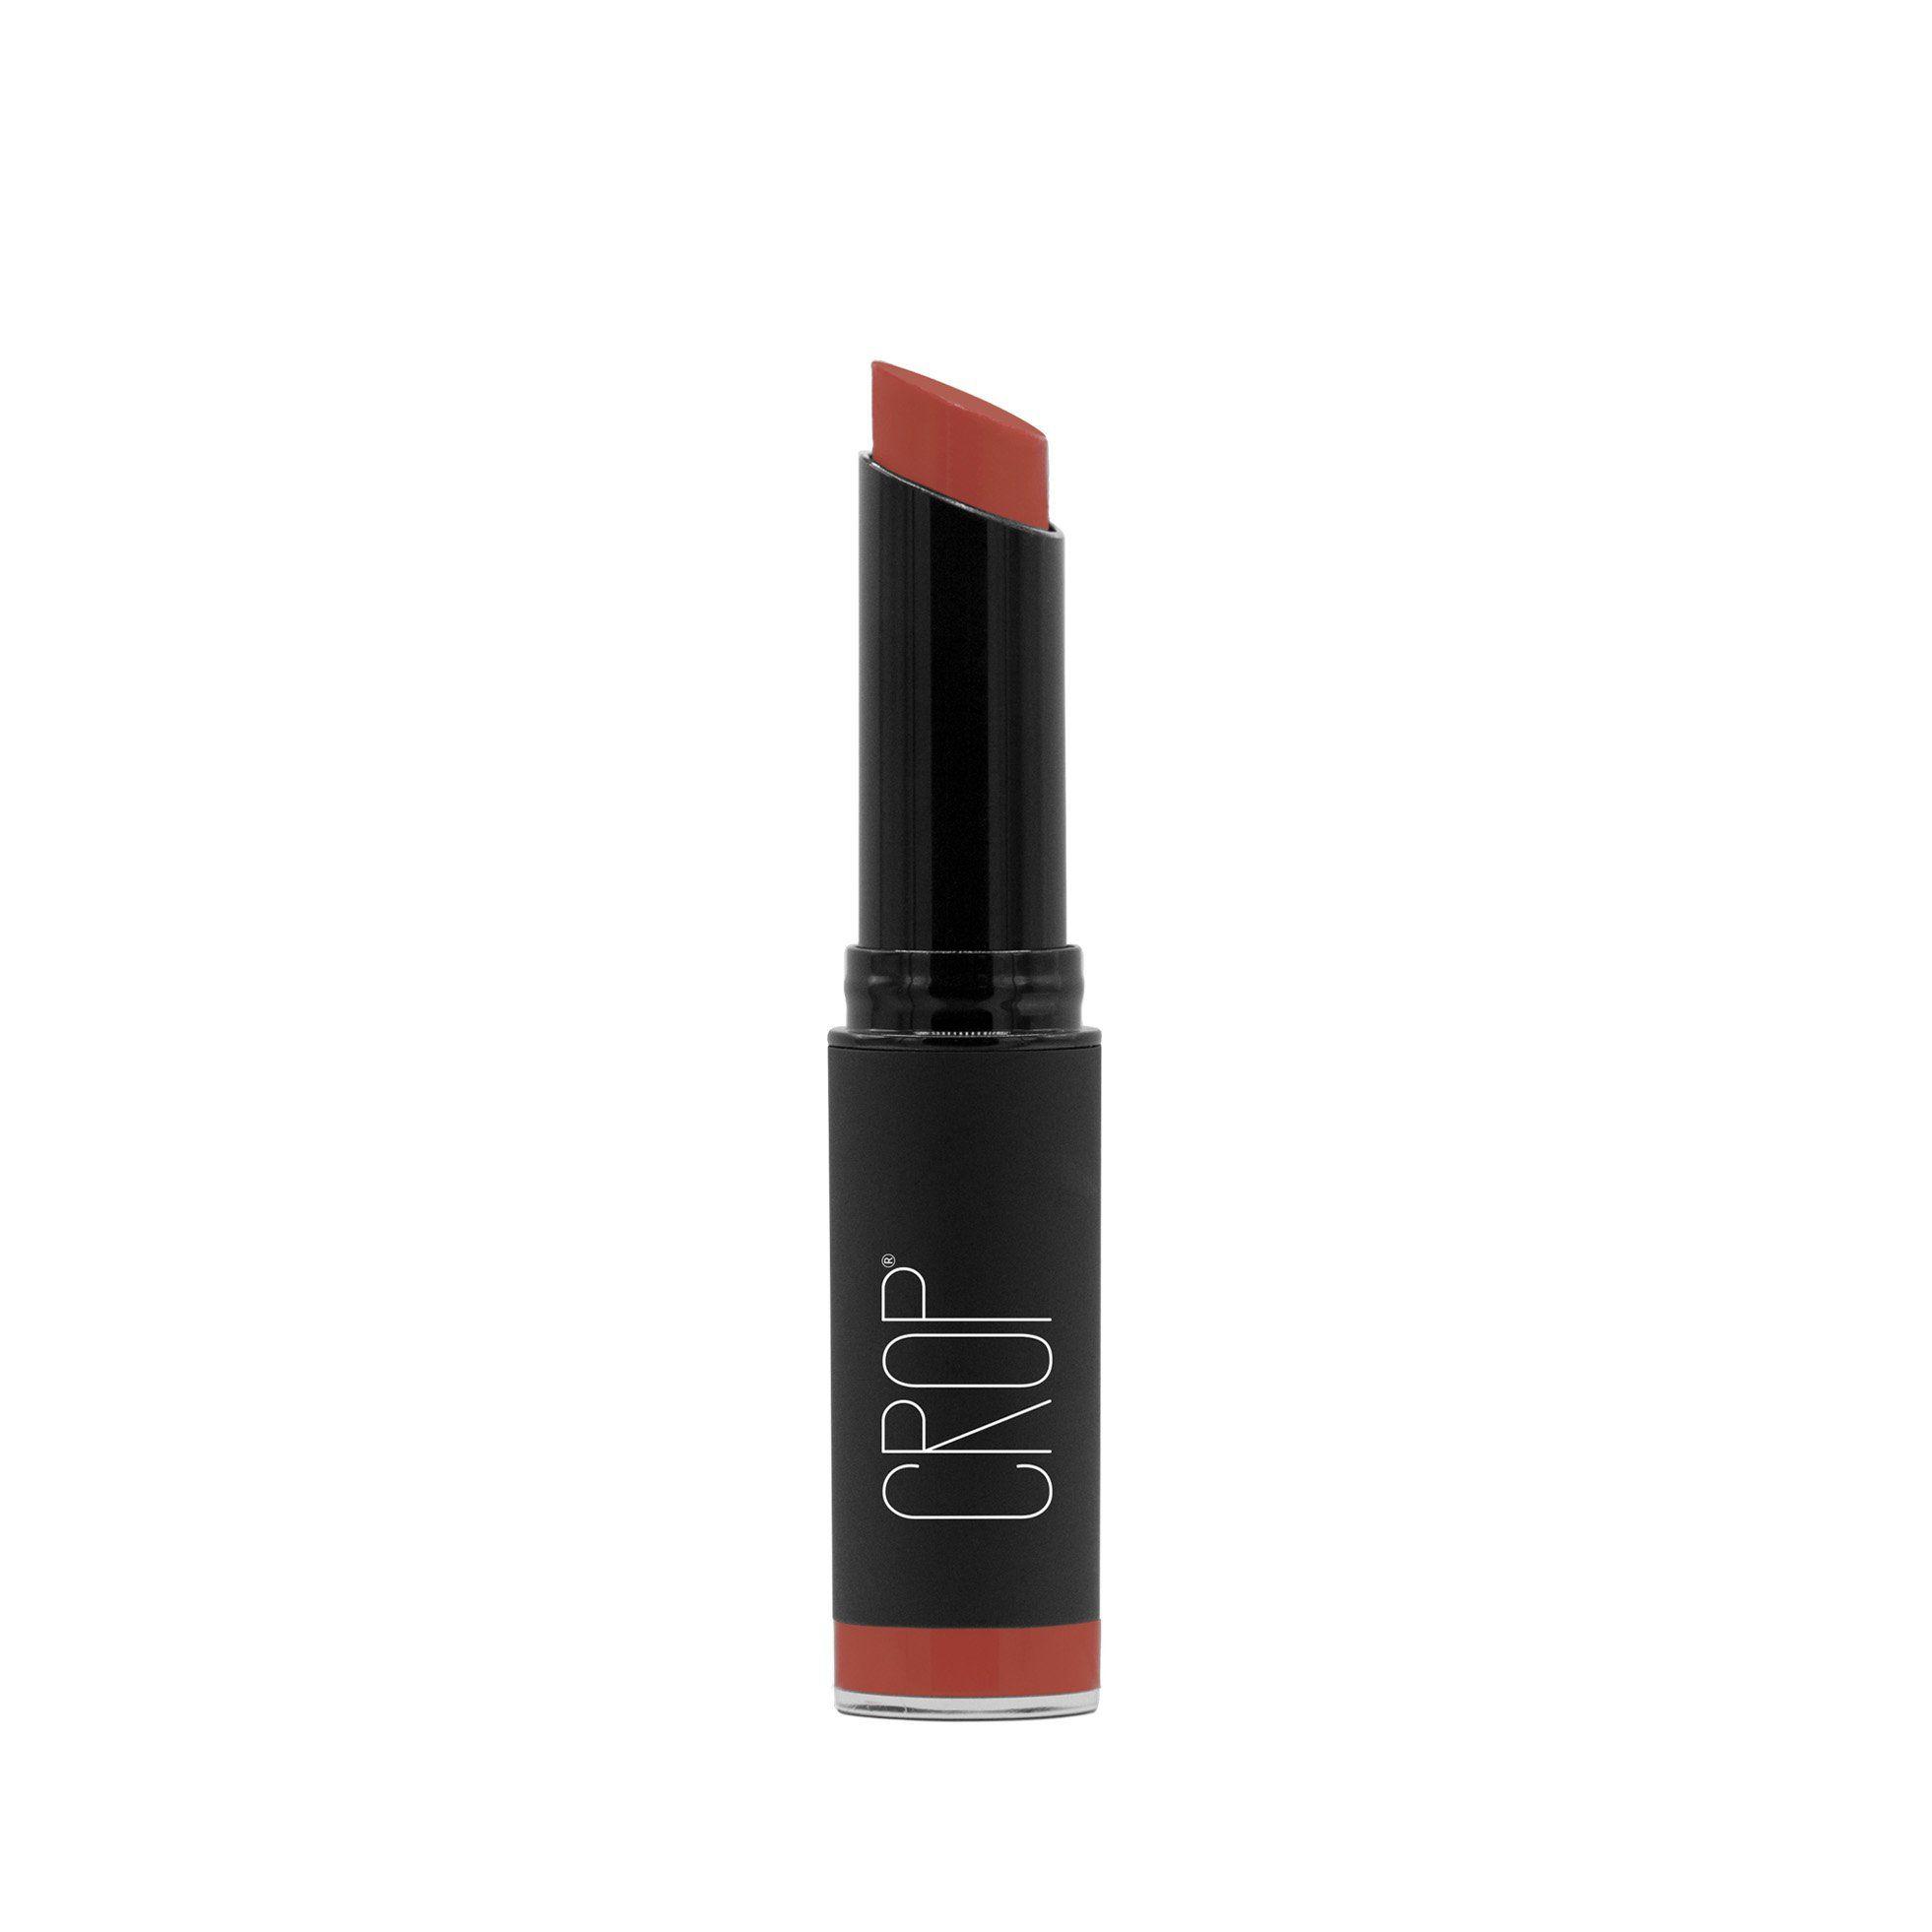 Crop Natural Intense Matte Lipstick in Dare Devil